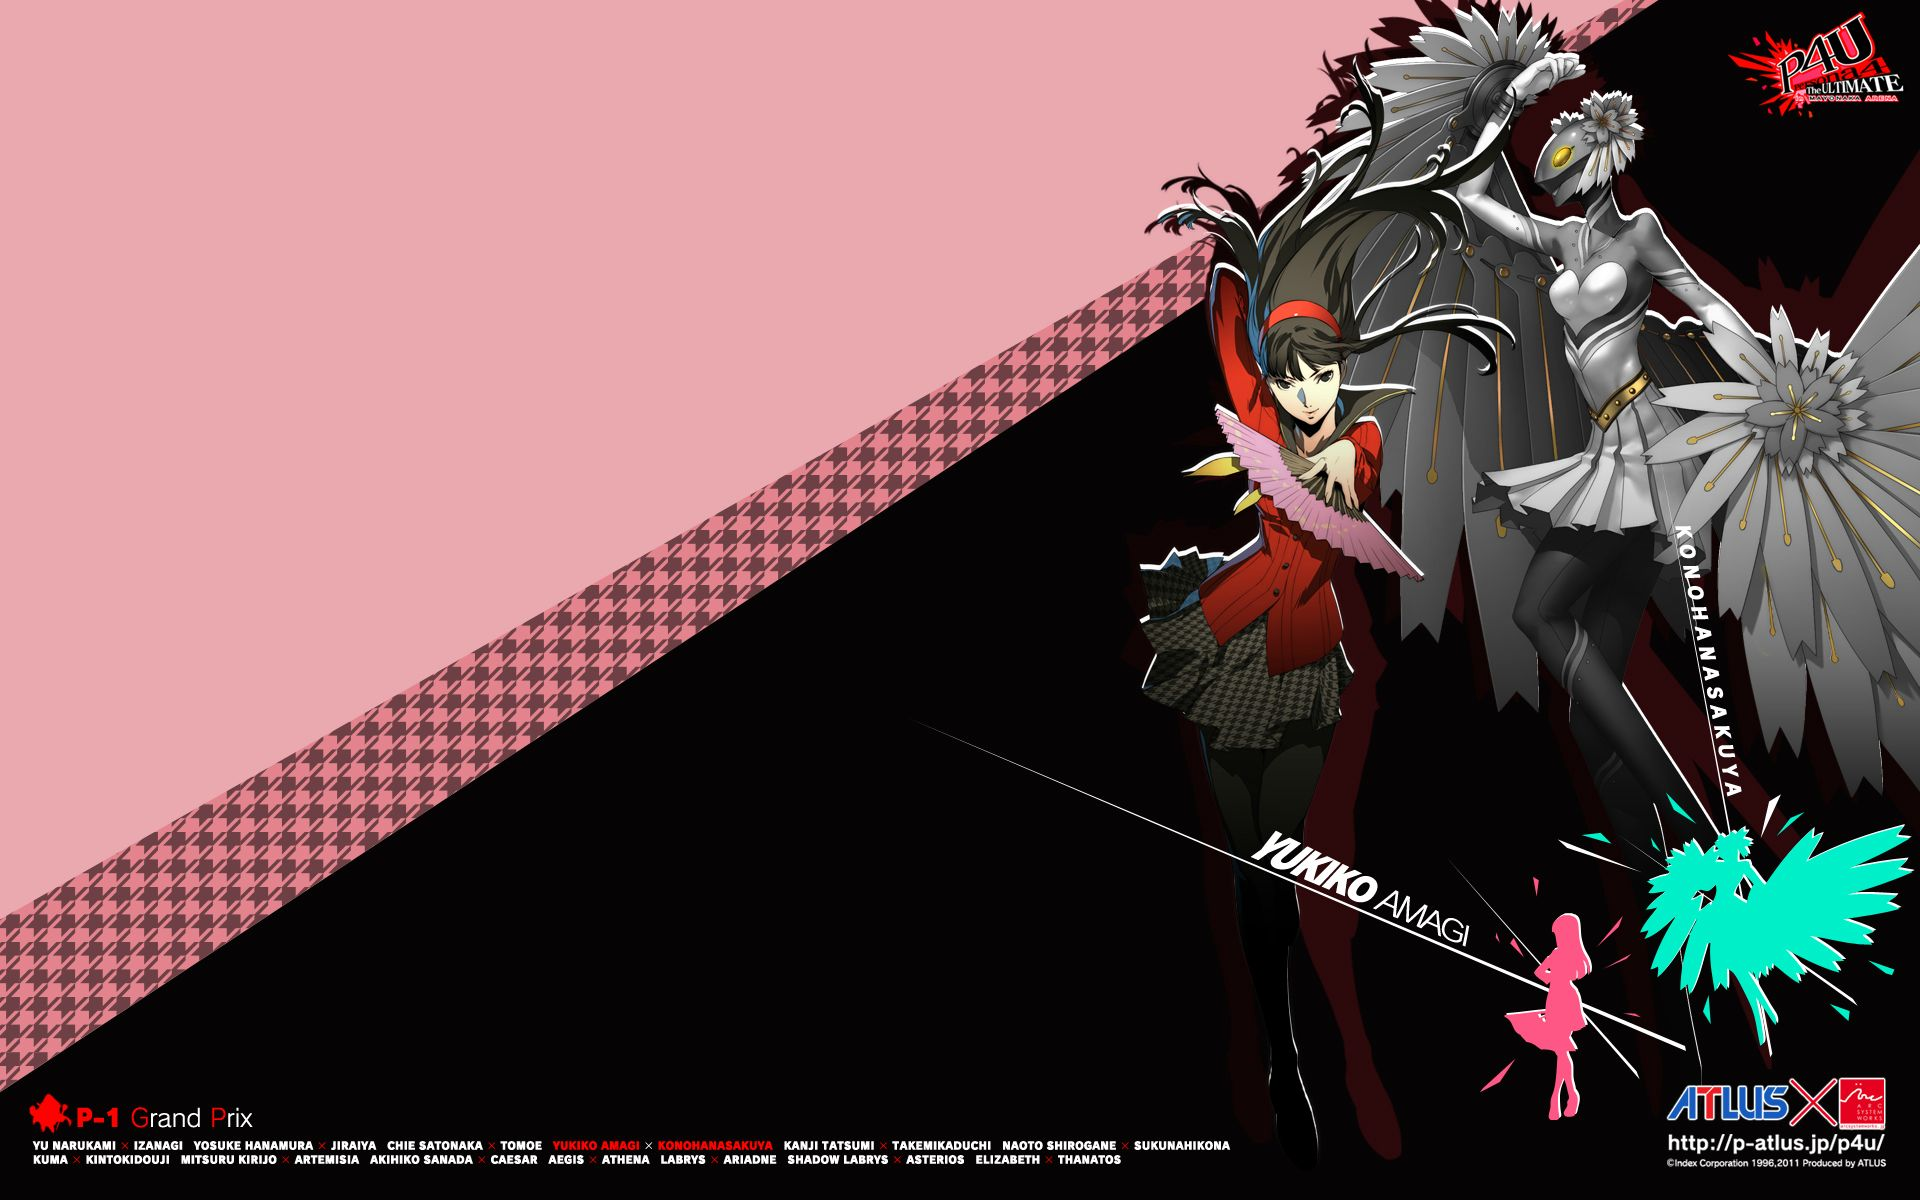 Persona 4: The Ultimat...Persona 4 Arena Yukiko Amagi